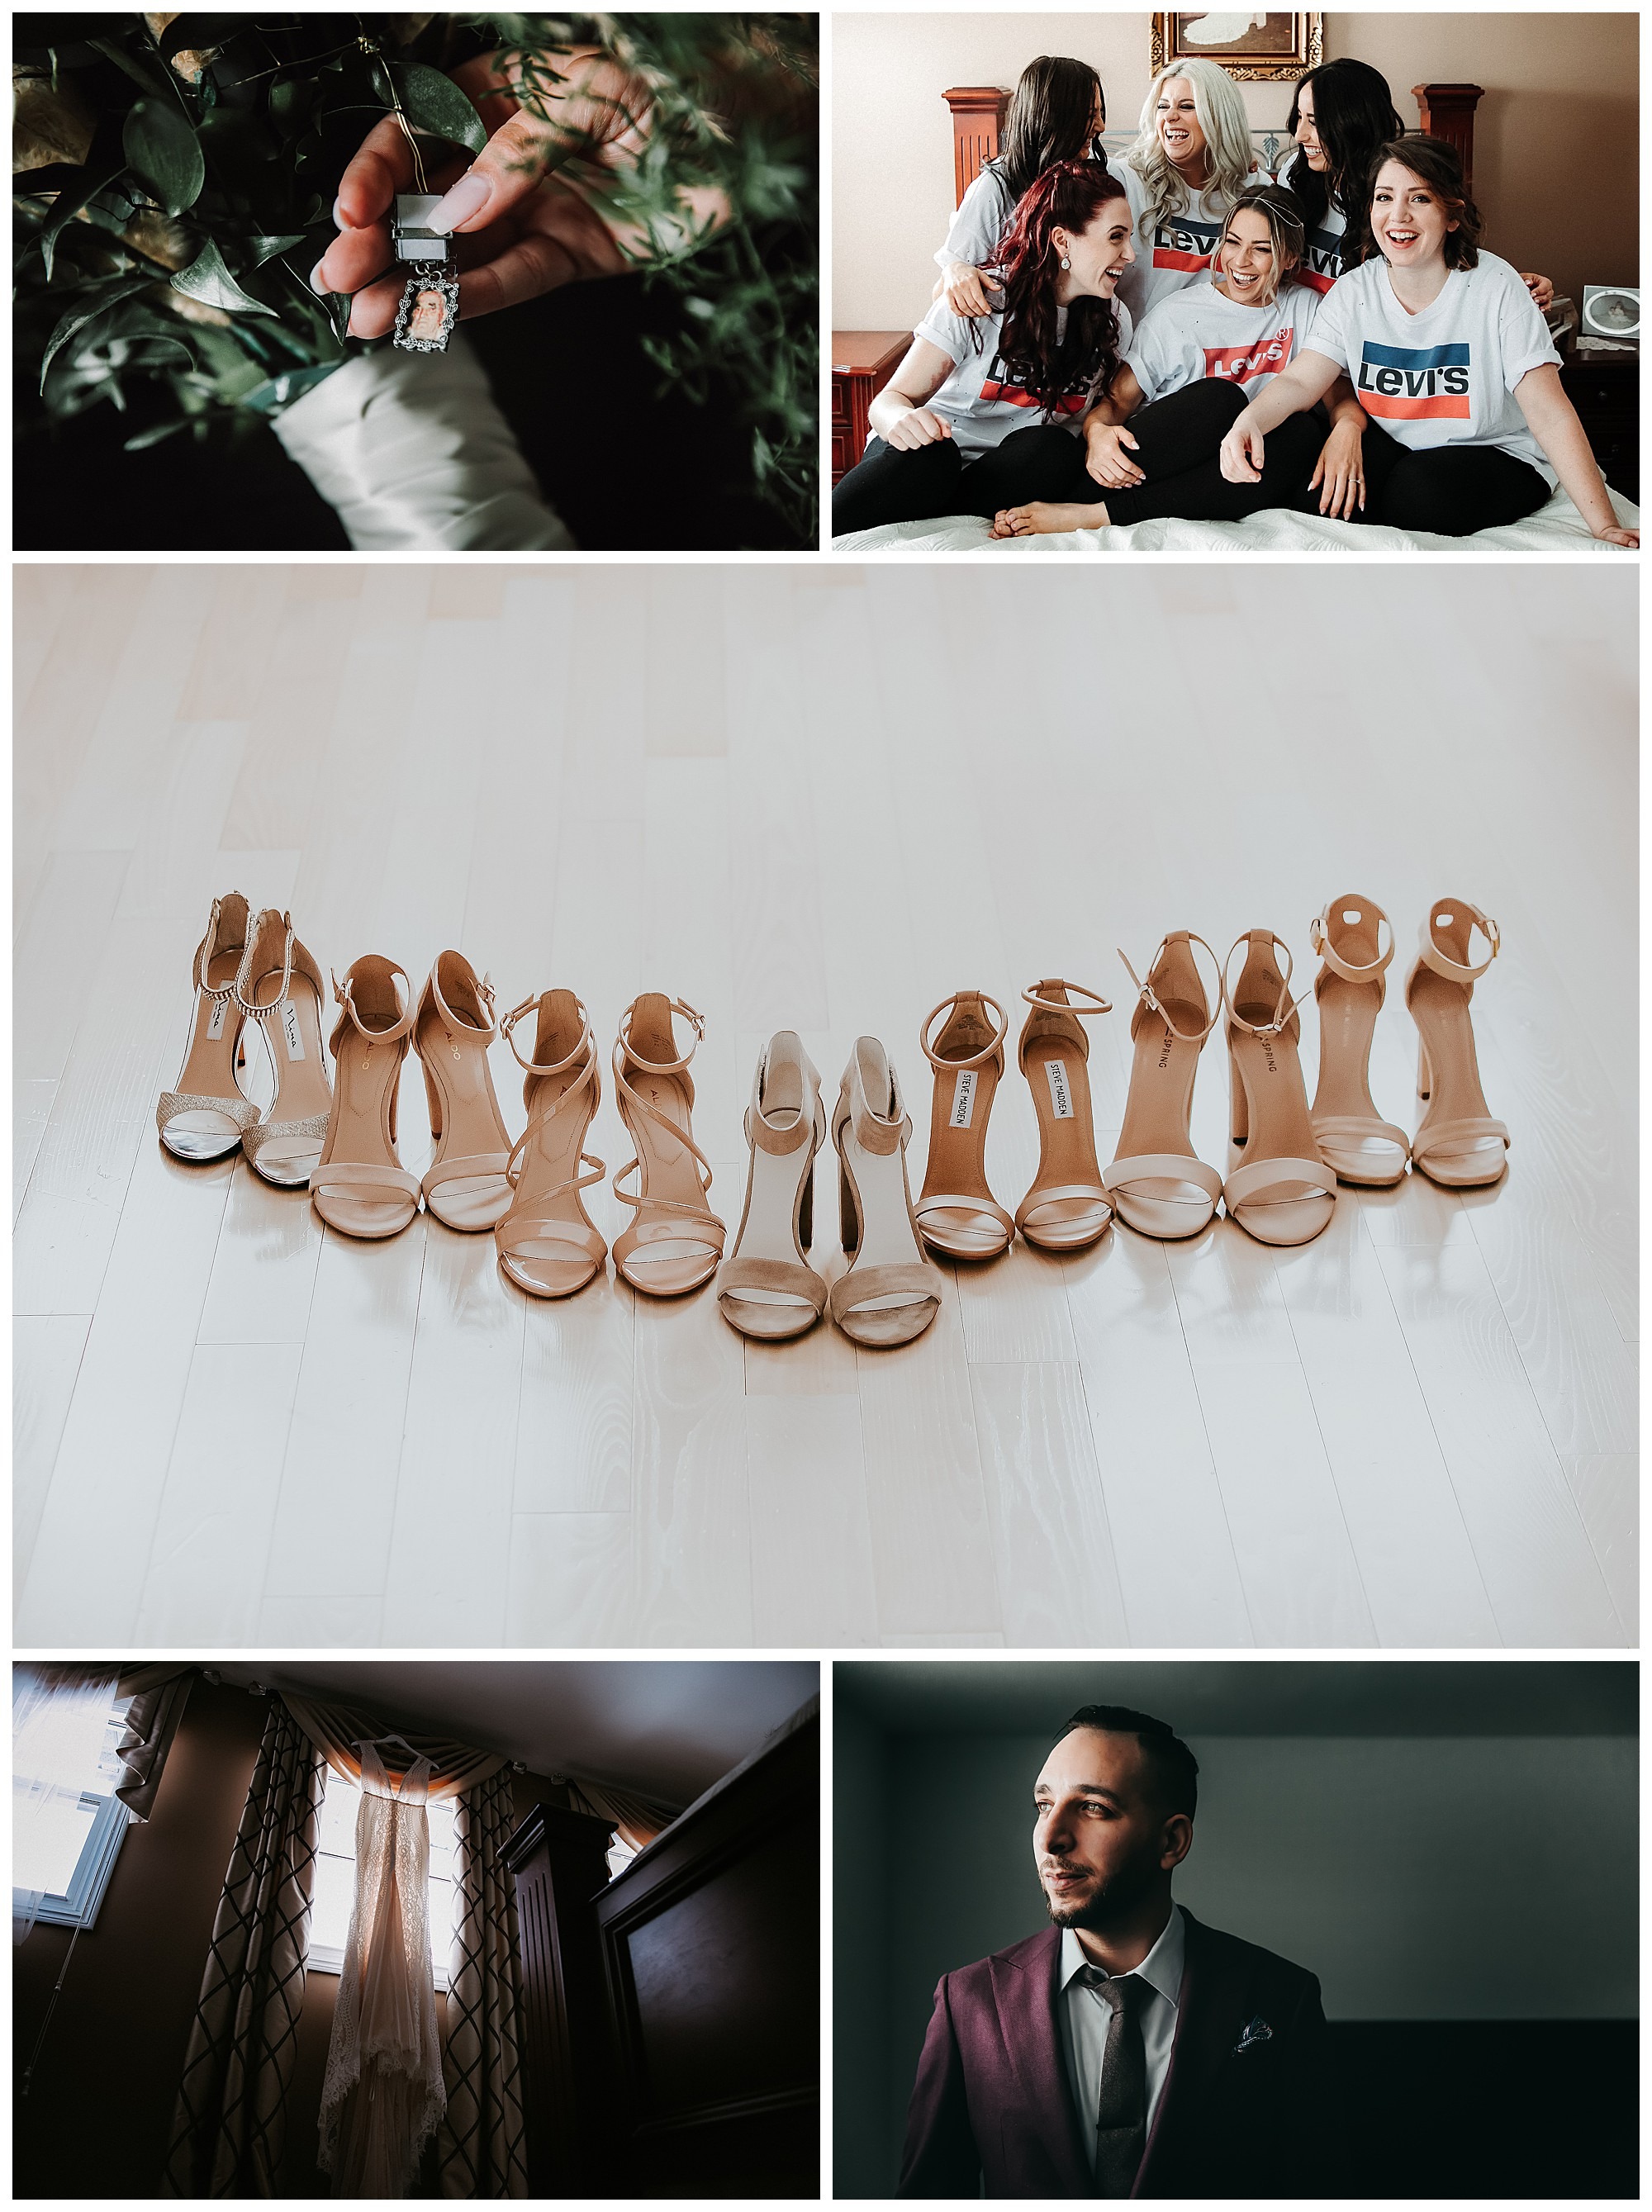 Joanna-Christos-Grand-Luxe-Wedding-Photos-Mint-Room-Toronto-VanDaele-Russell_0061.jpg